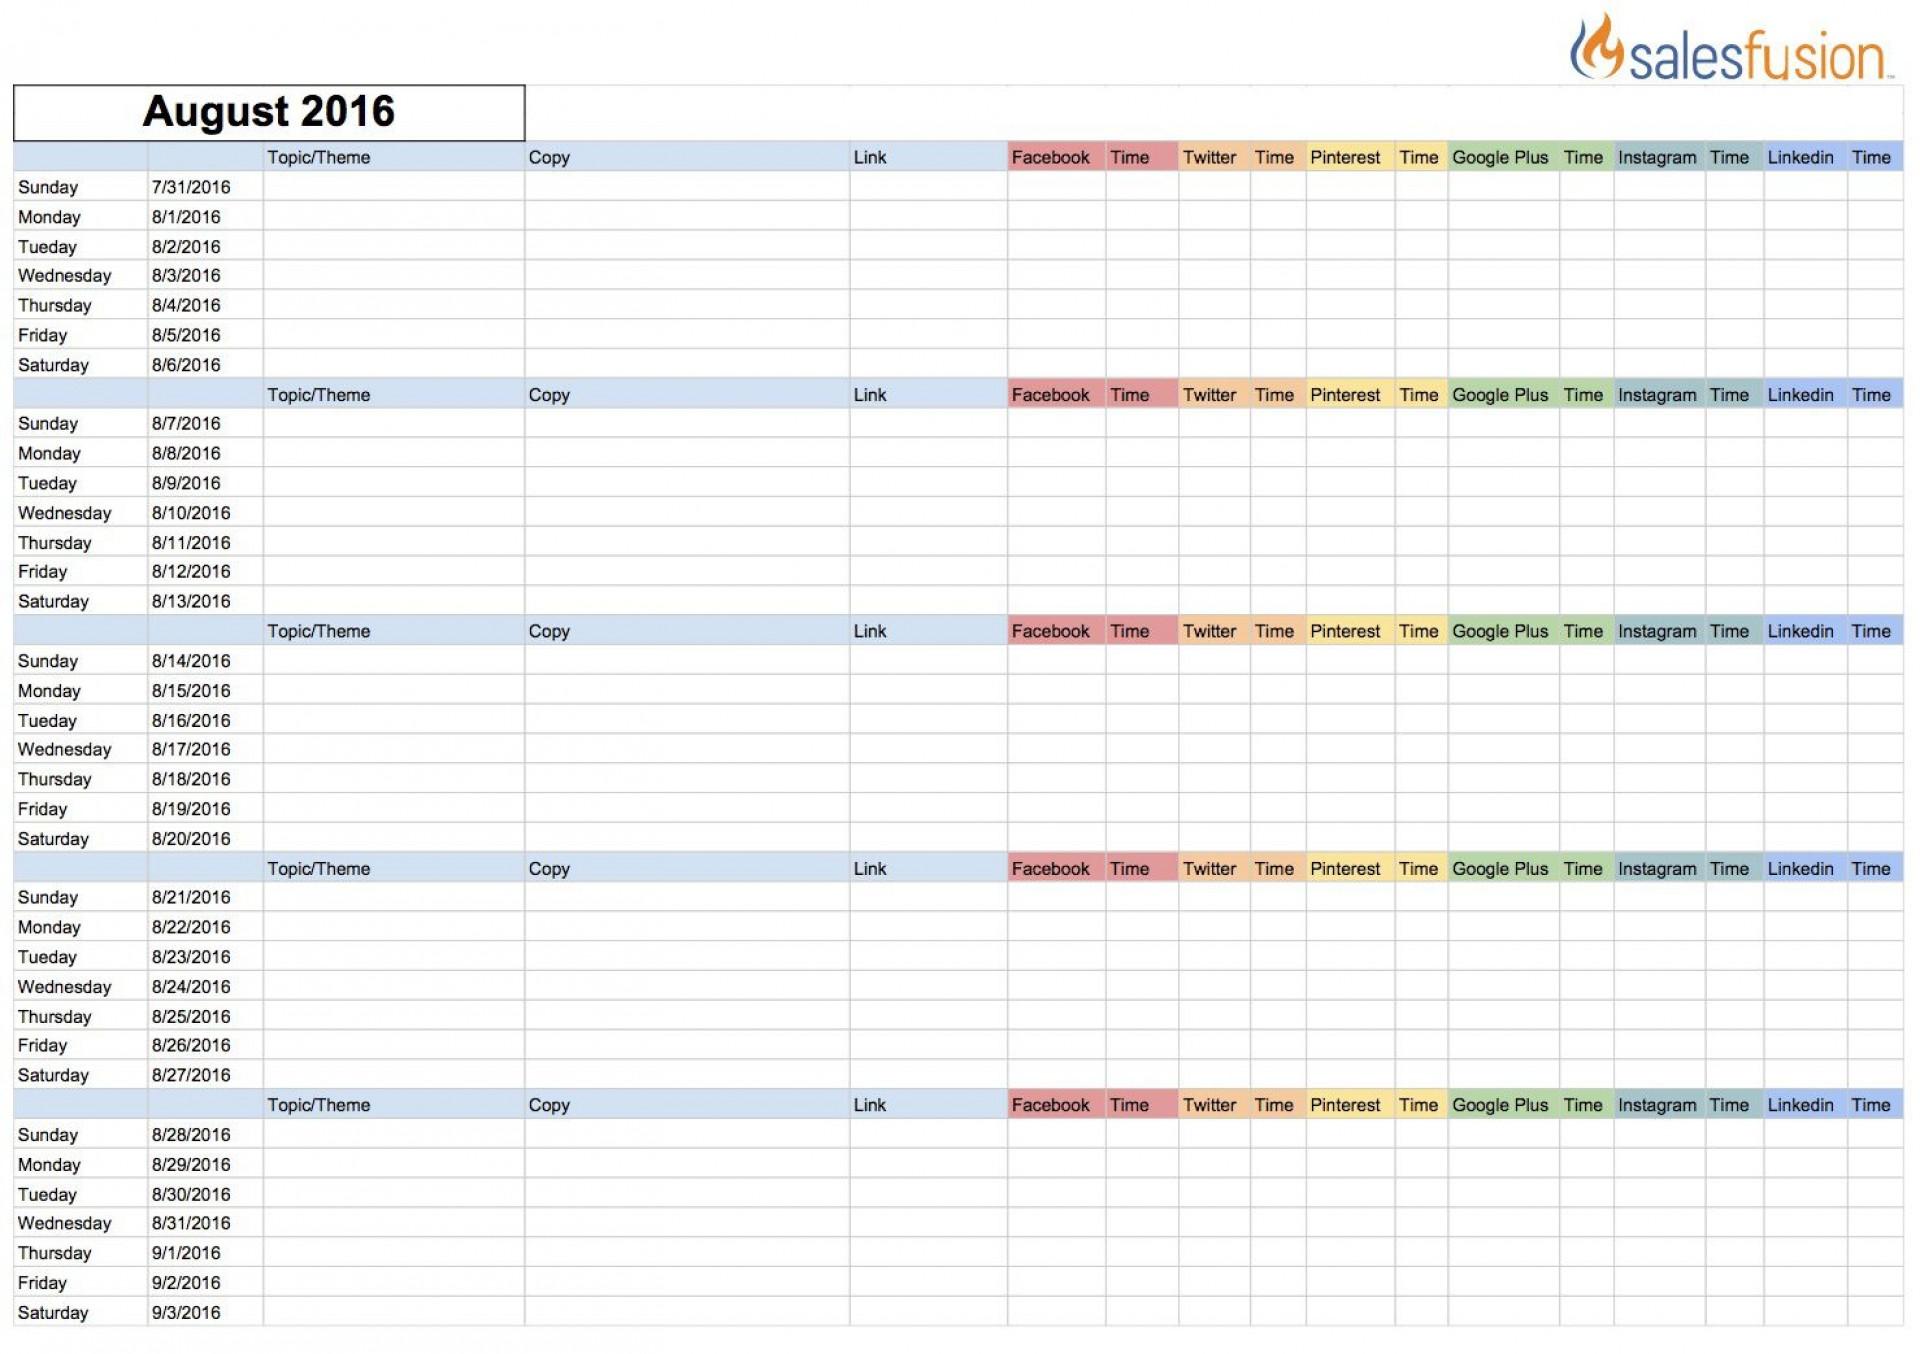 002 Fascinating Social Media Editorial Calendar Template Concept  Content Excel 2020 Free Download1920